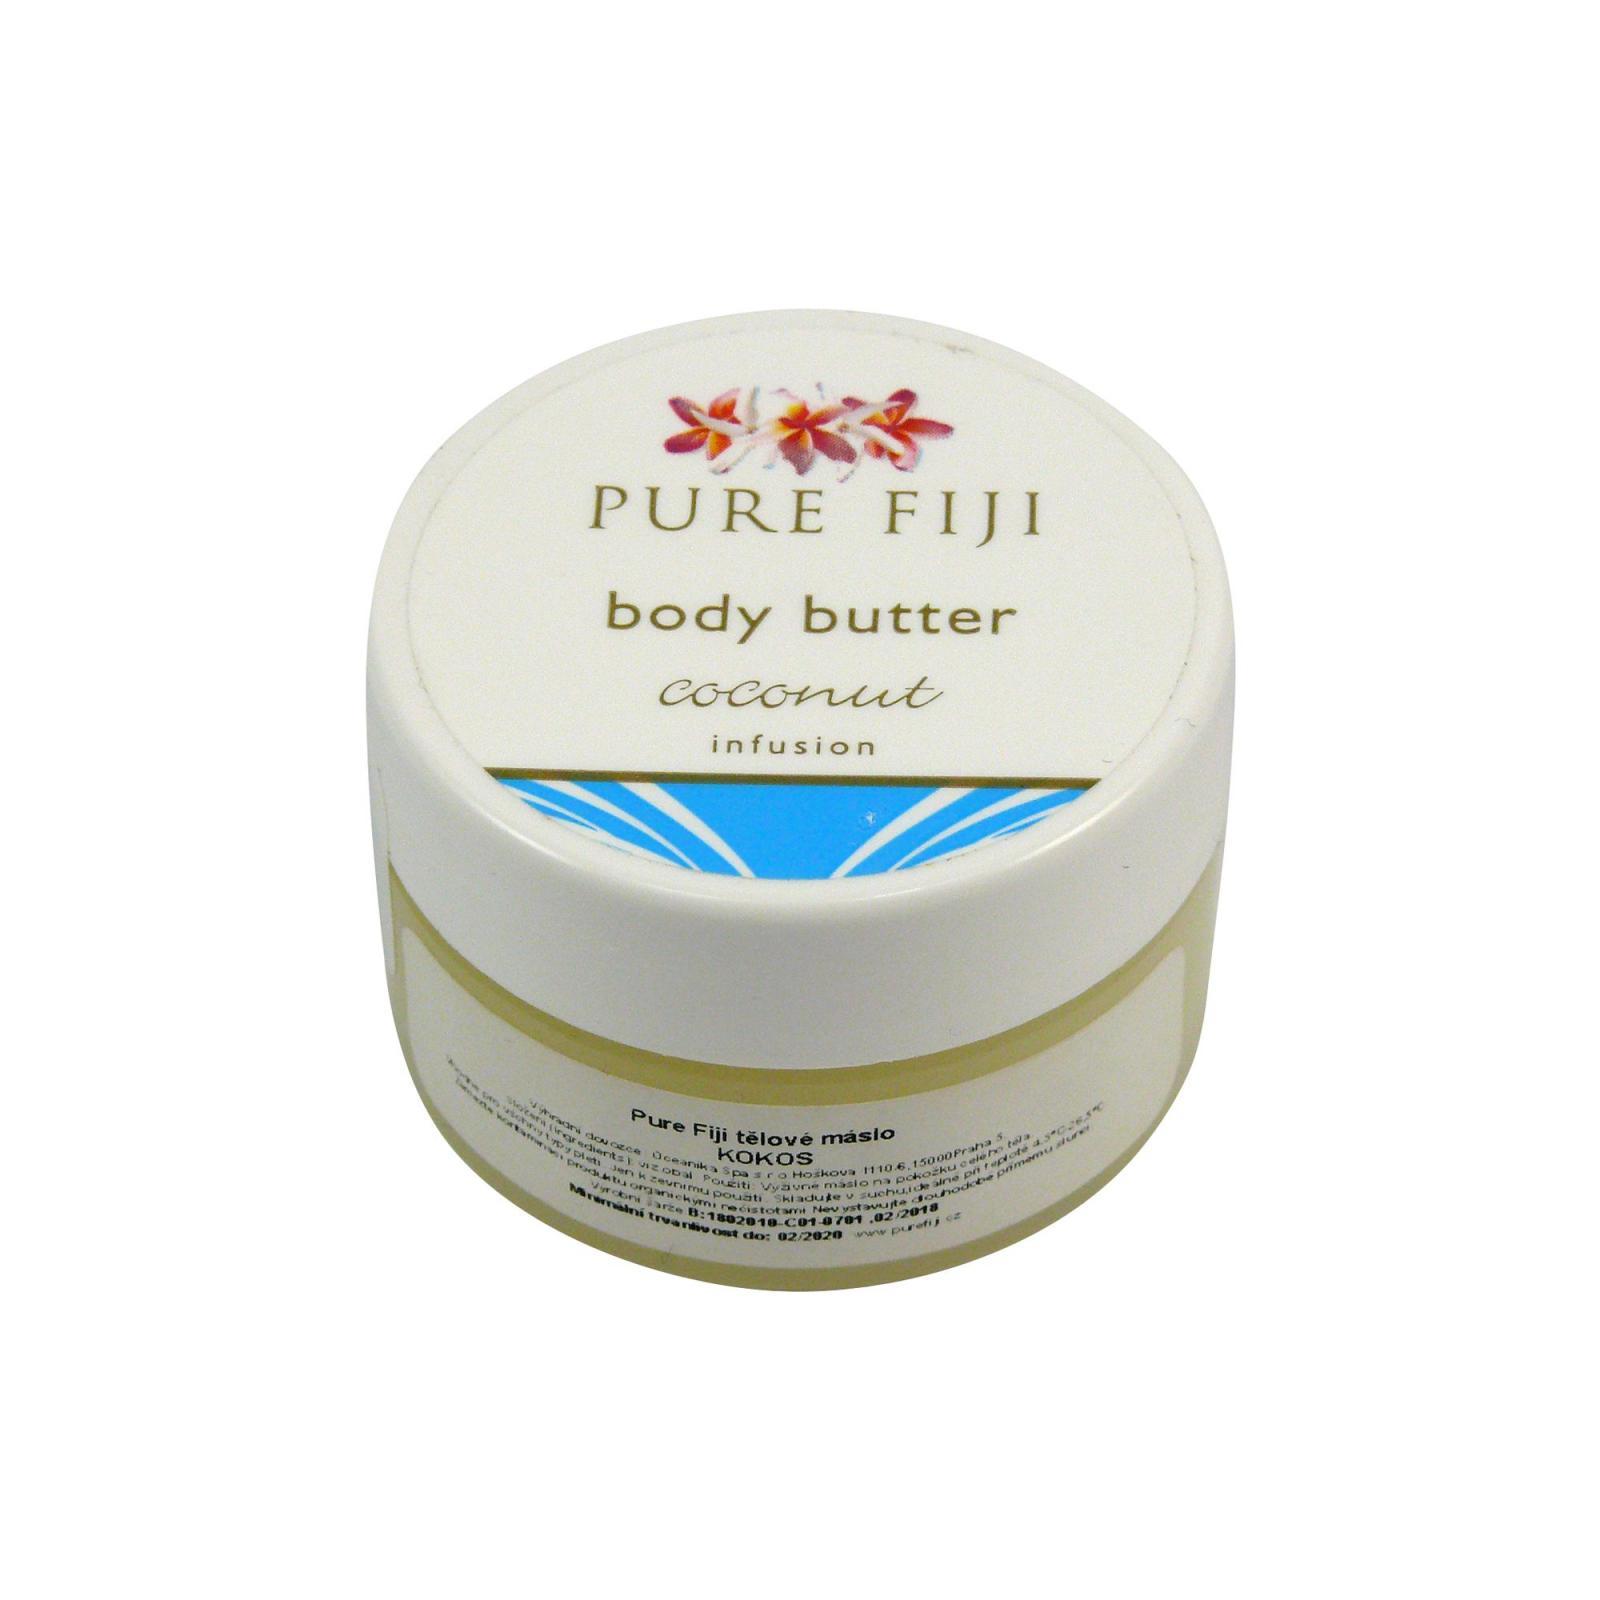 Pure Fiji Tělové máslo, kokos 15 ml